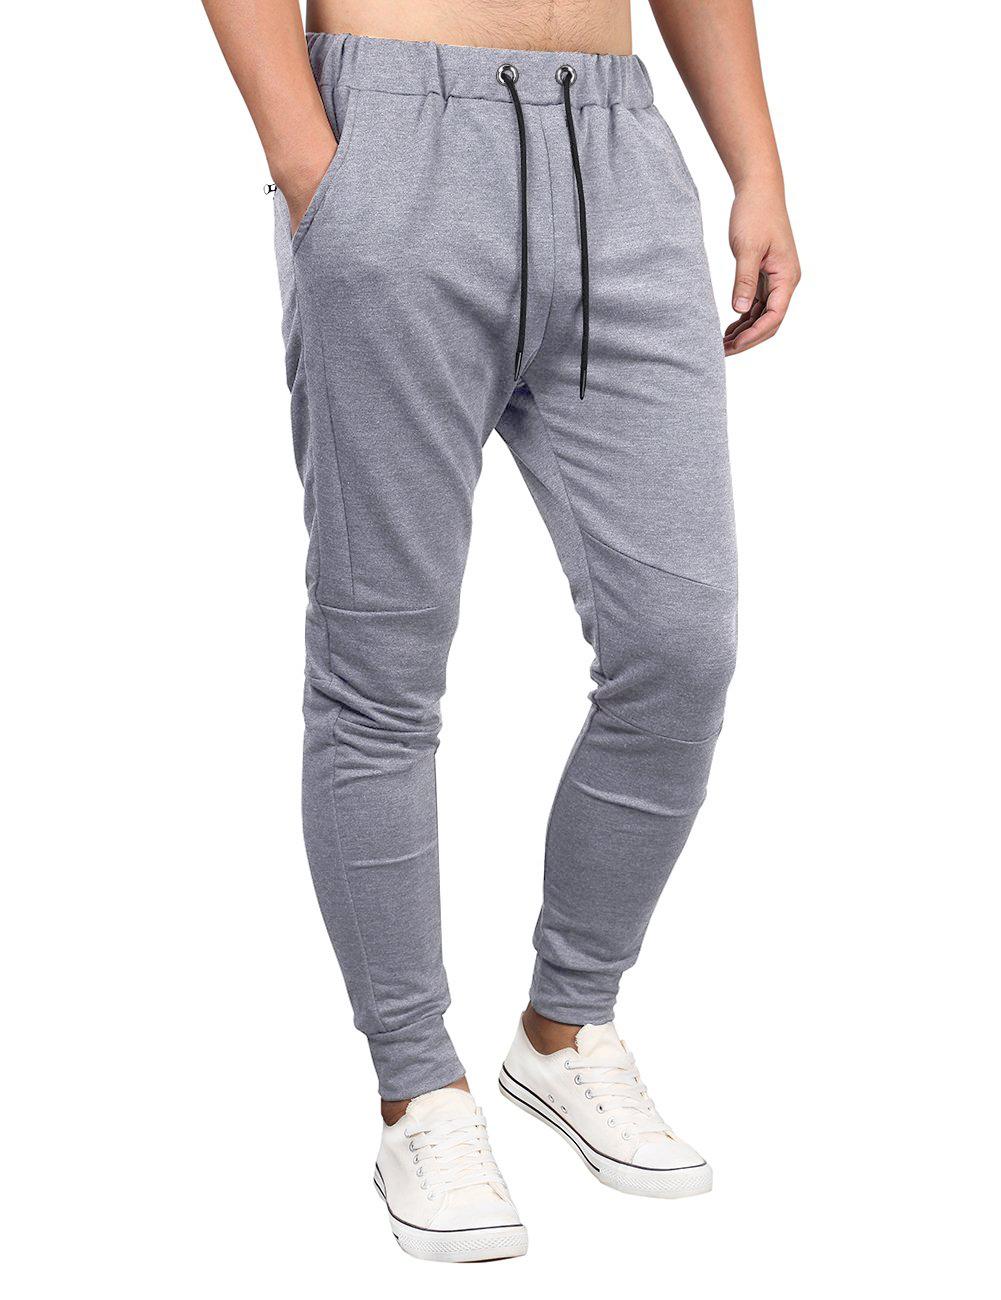 Kuulee Men's Casual Sport Jogger Drawstring Pants Sweatpants with Pockets